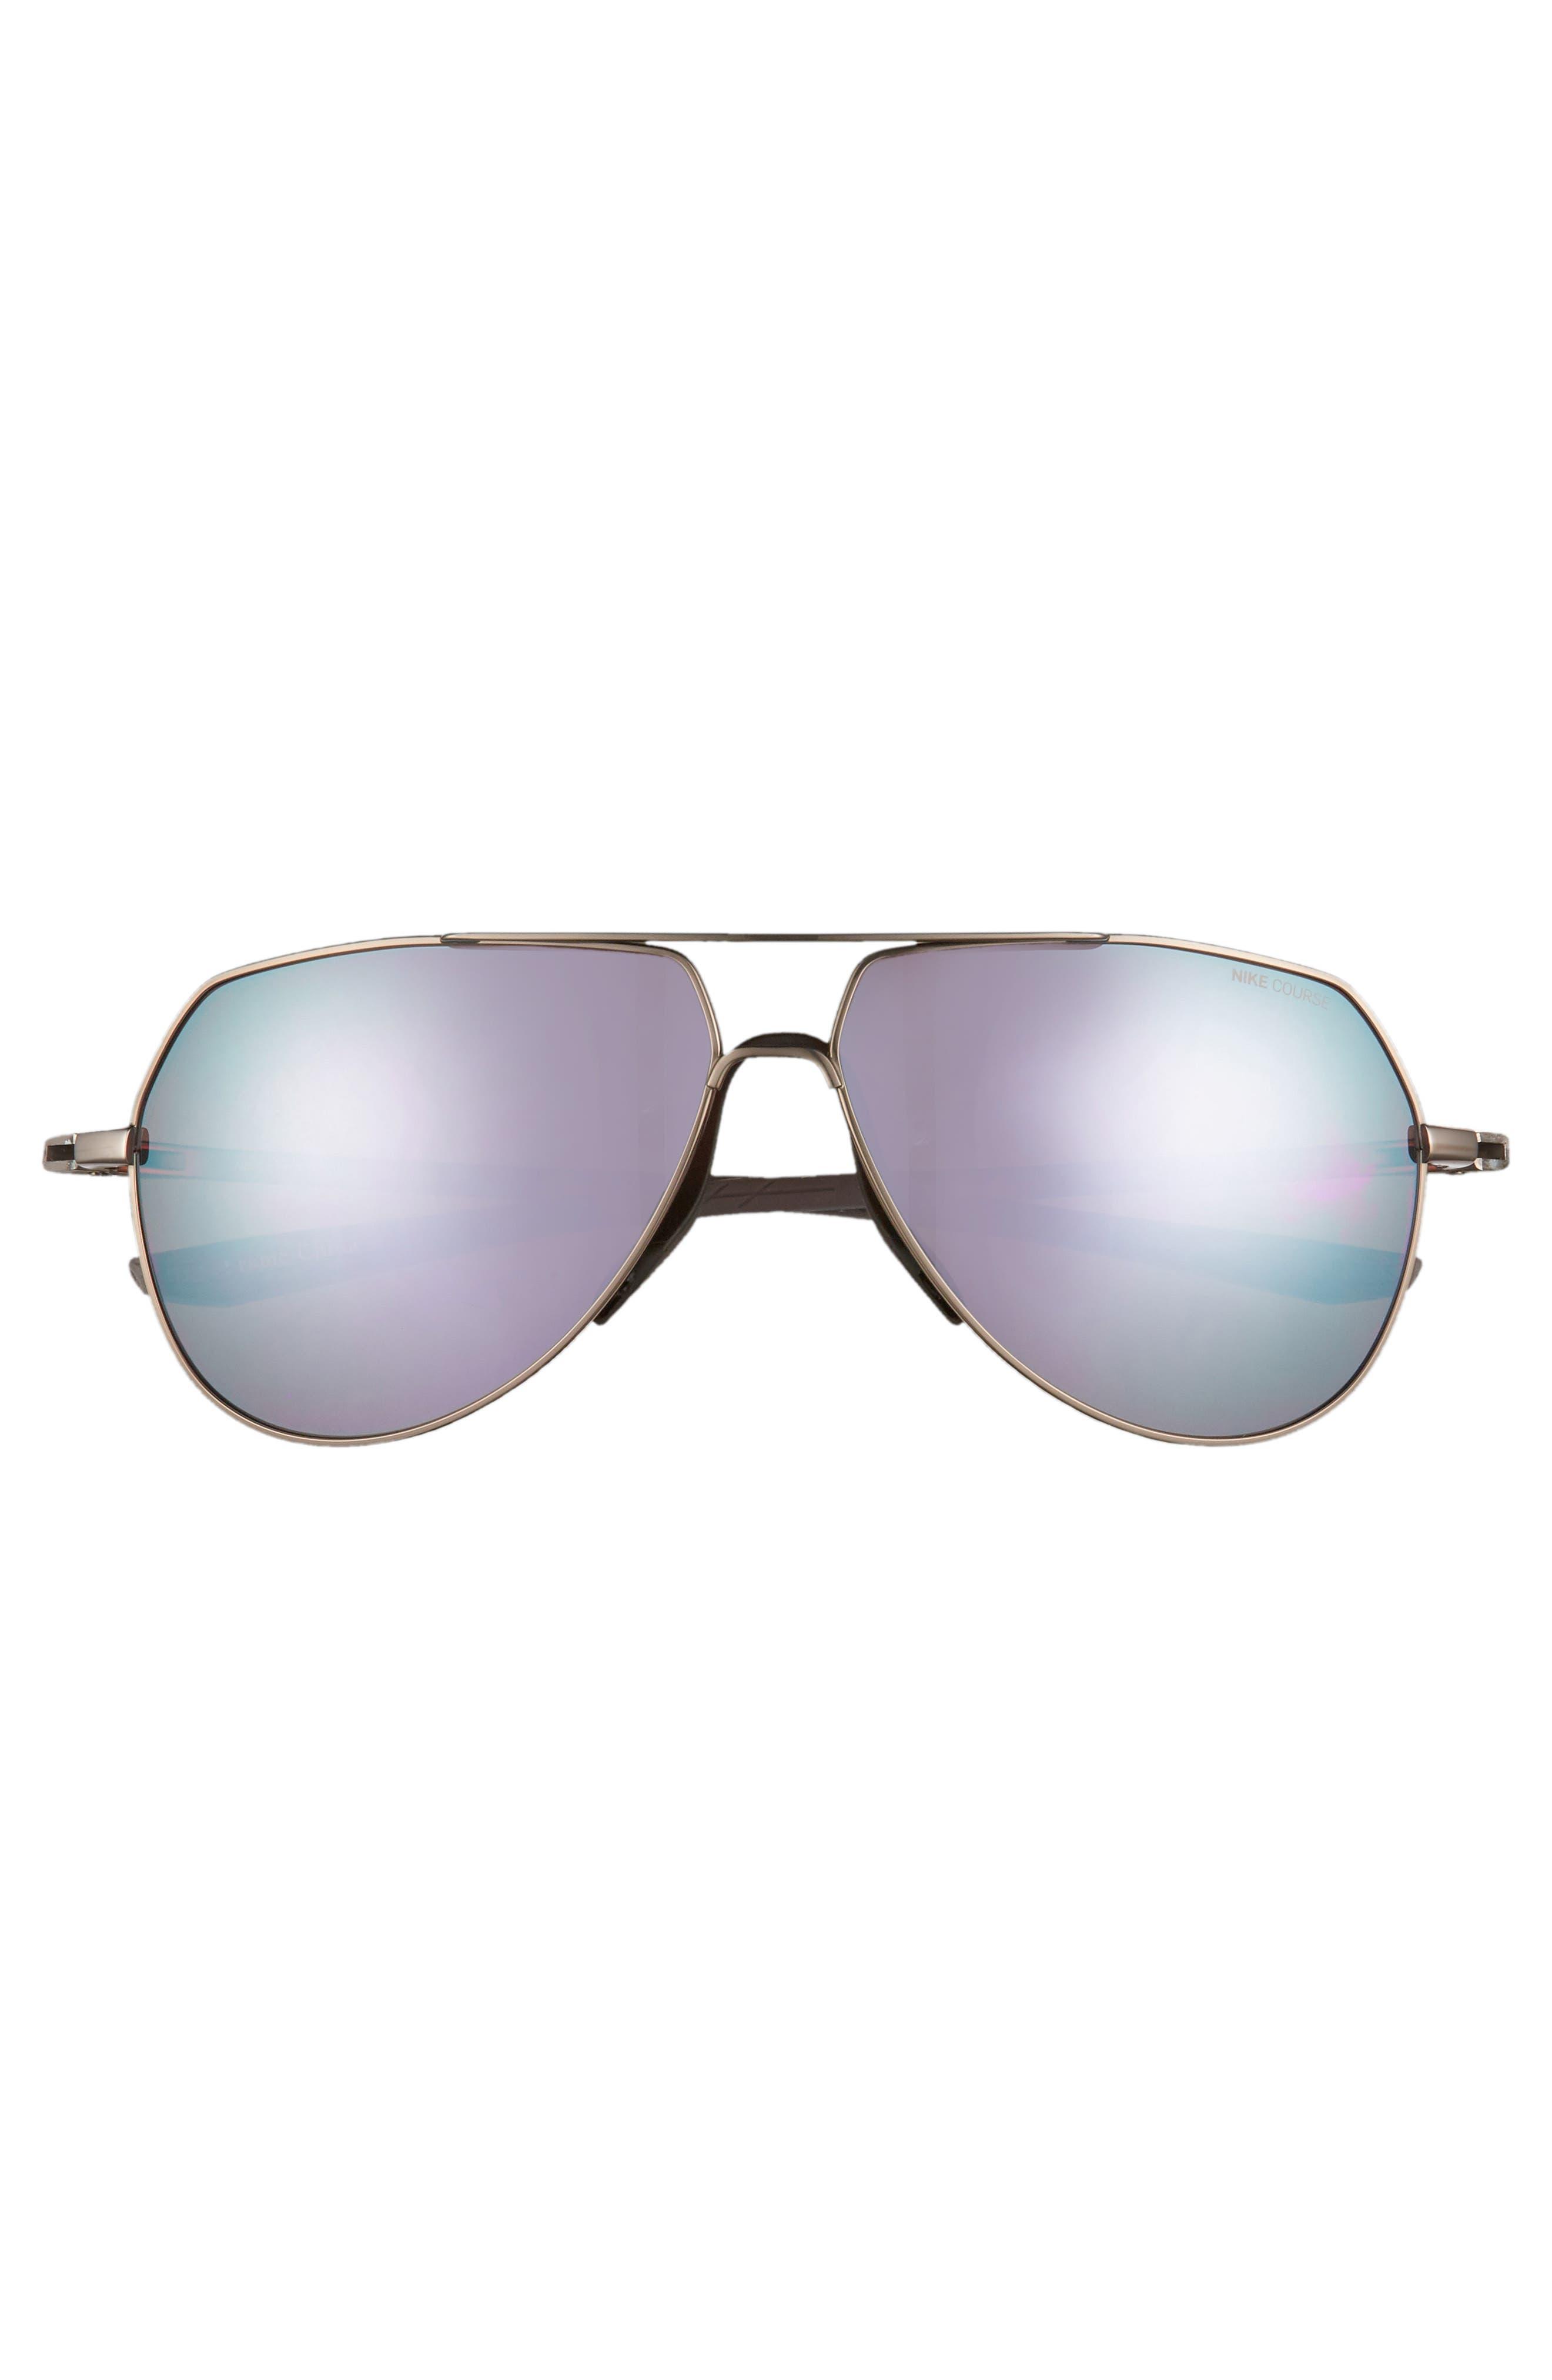 Outrider E 62mm Oversize Aviator Sunglasses,                             Alternate thumbnail 2, color,                             PEWTER/ GOLF MILKY BLUE